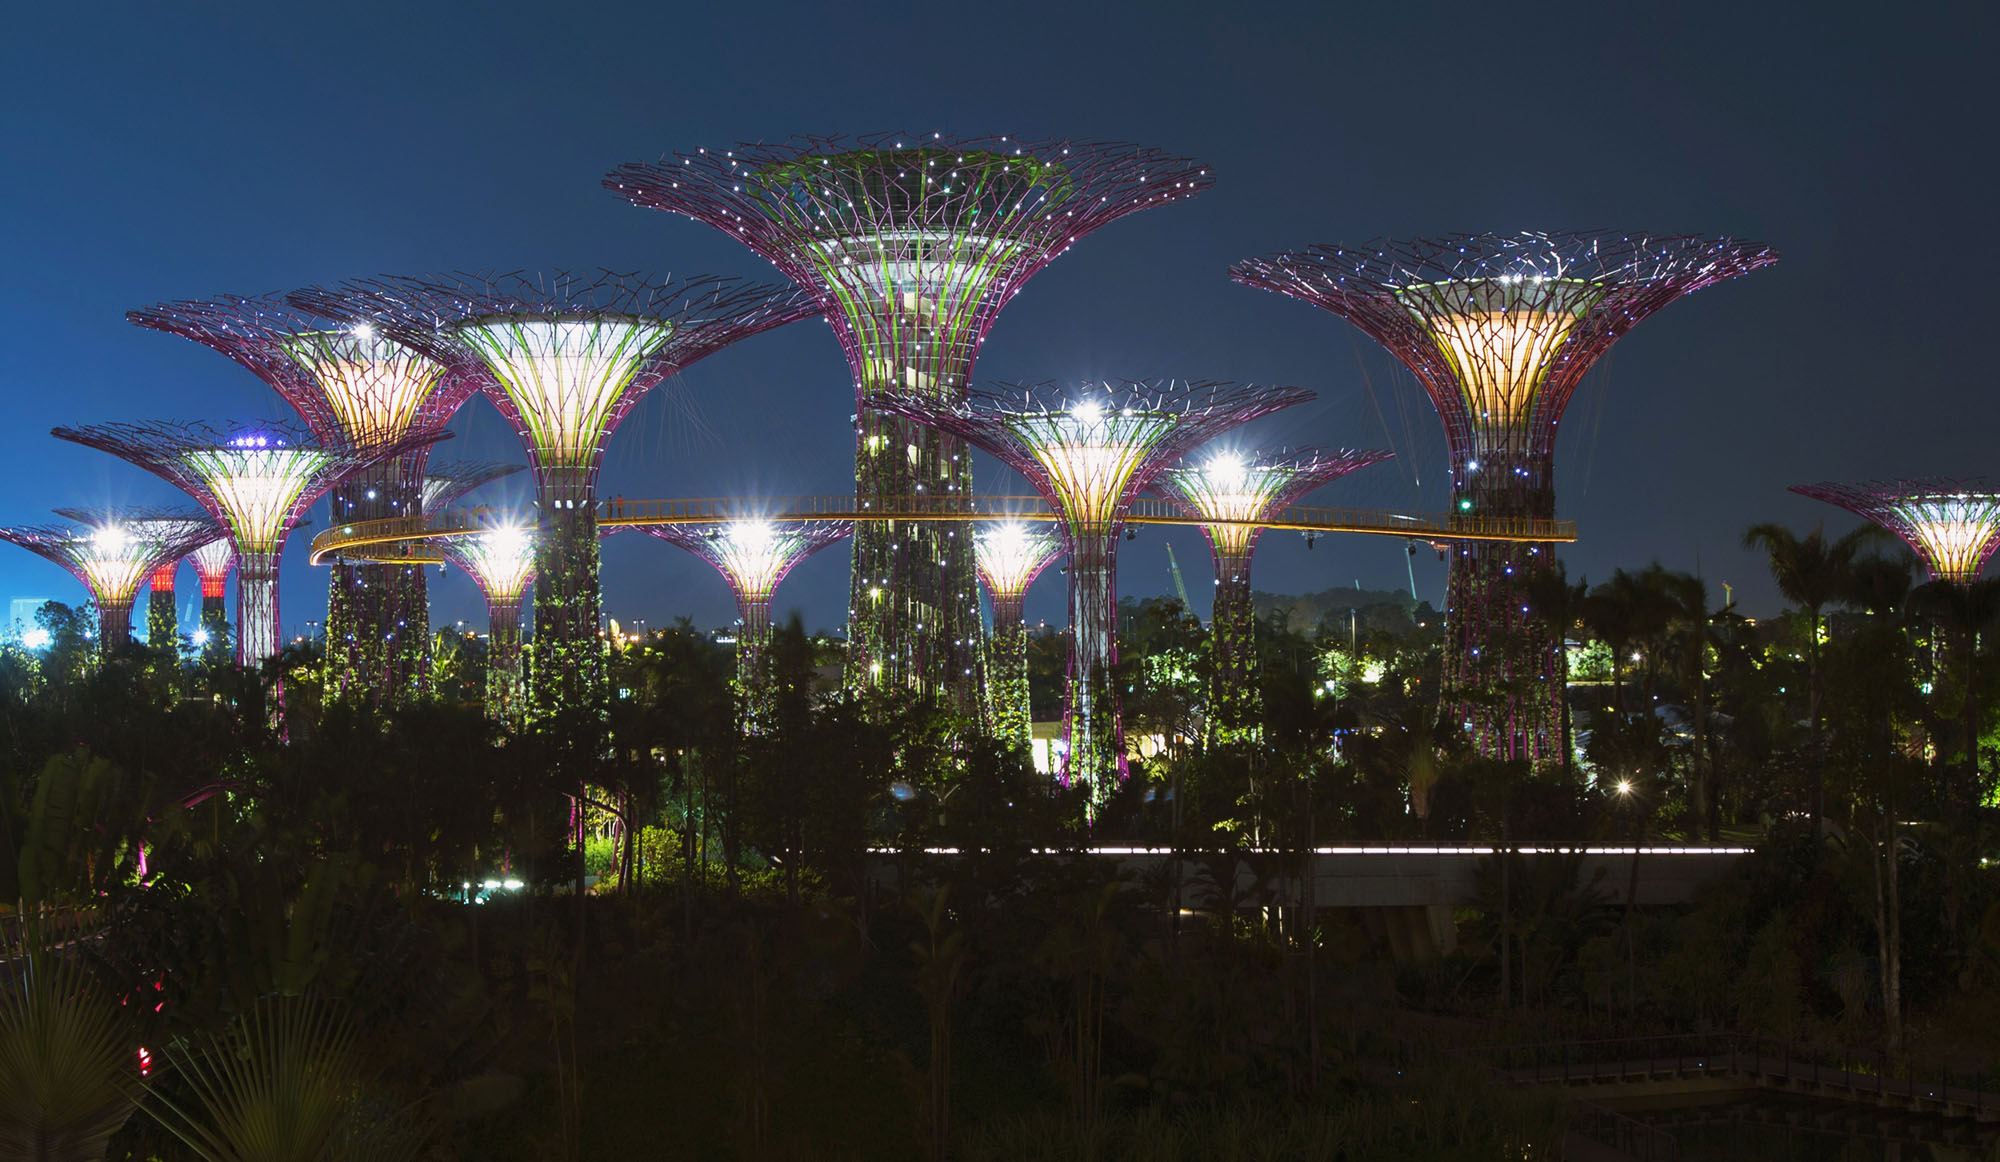 Le jardin extraordinaire de singapour for Le jardin extraordinaire 09